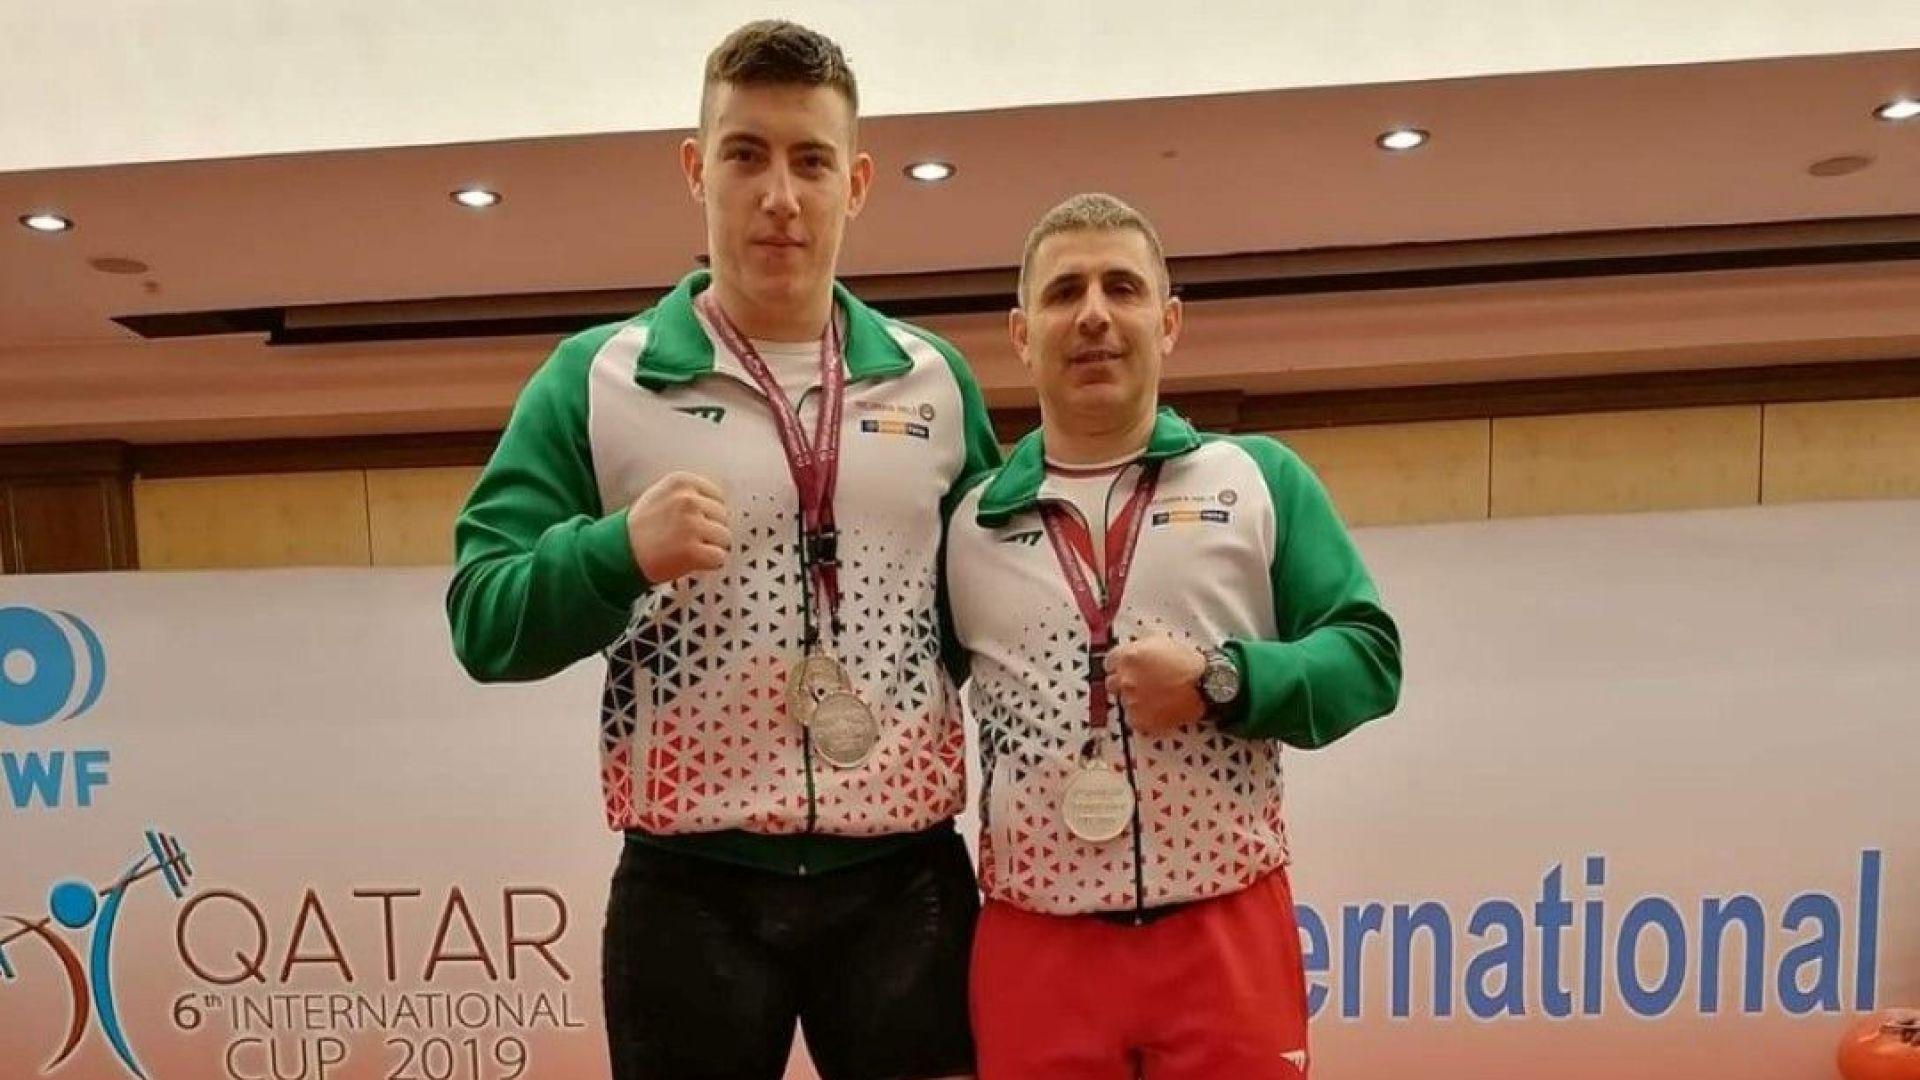 Христо Христов грабна три медала от Доха